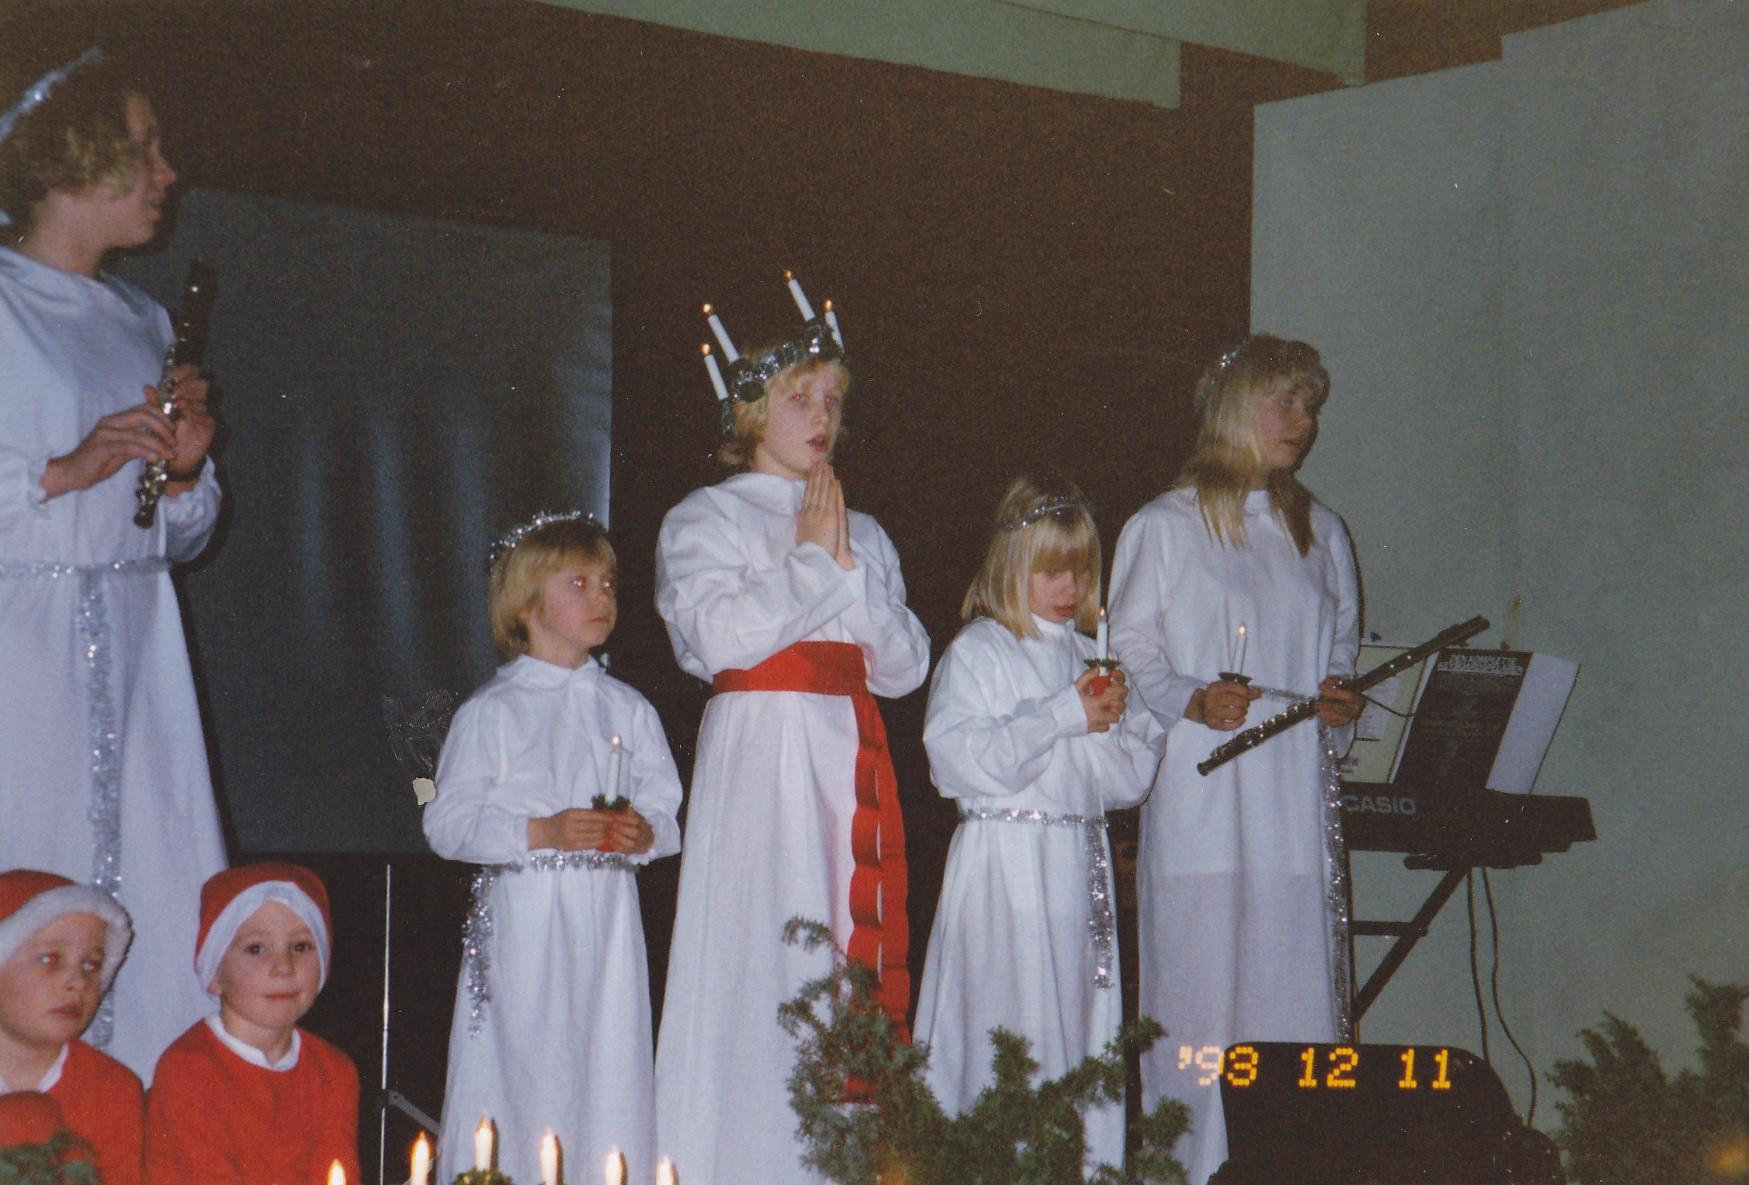 1993 - 2